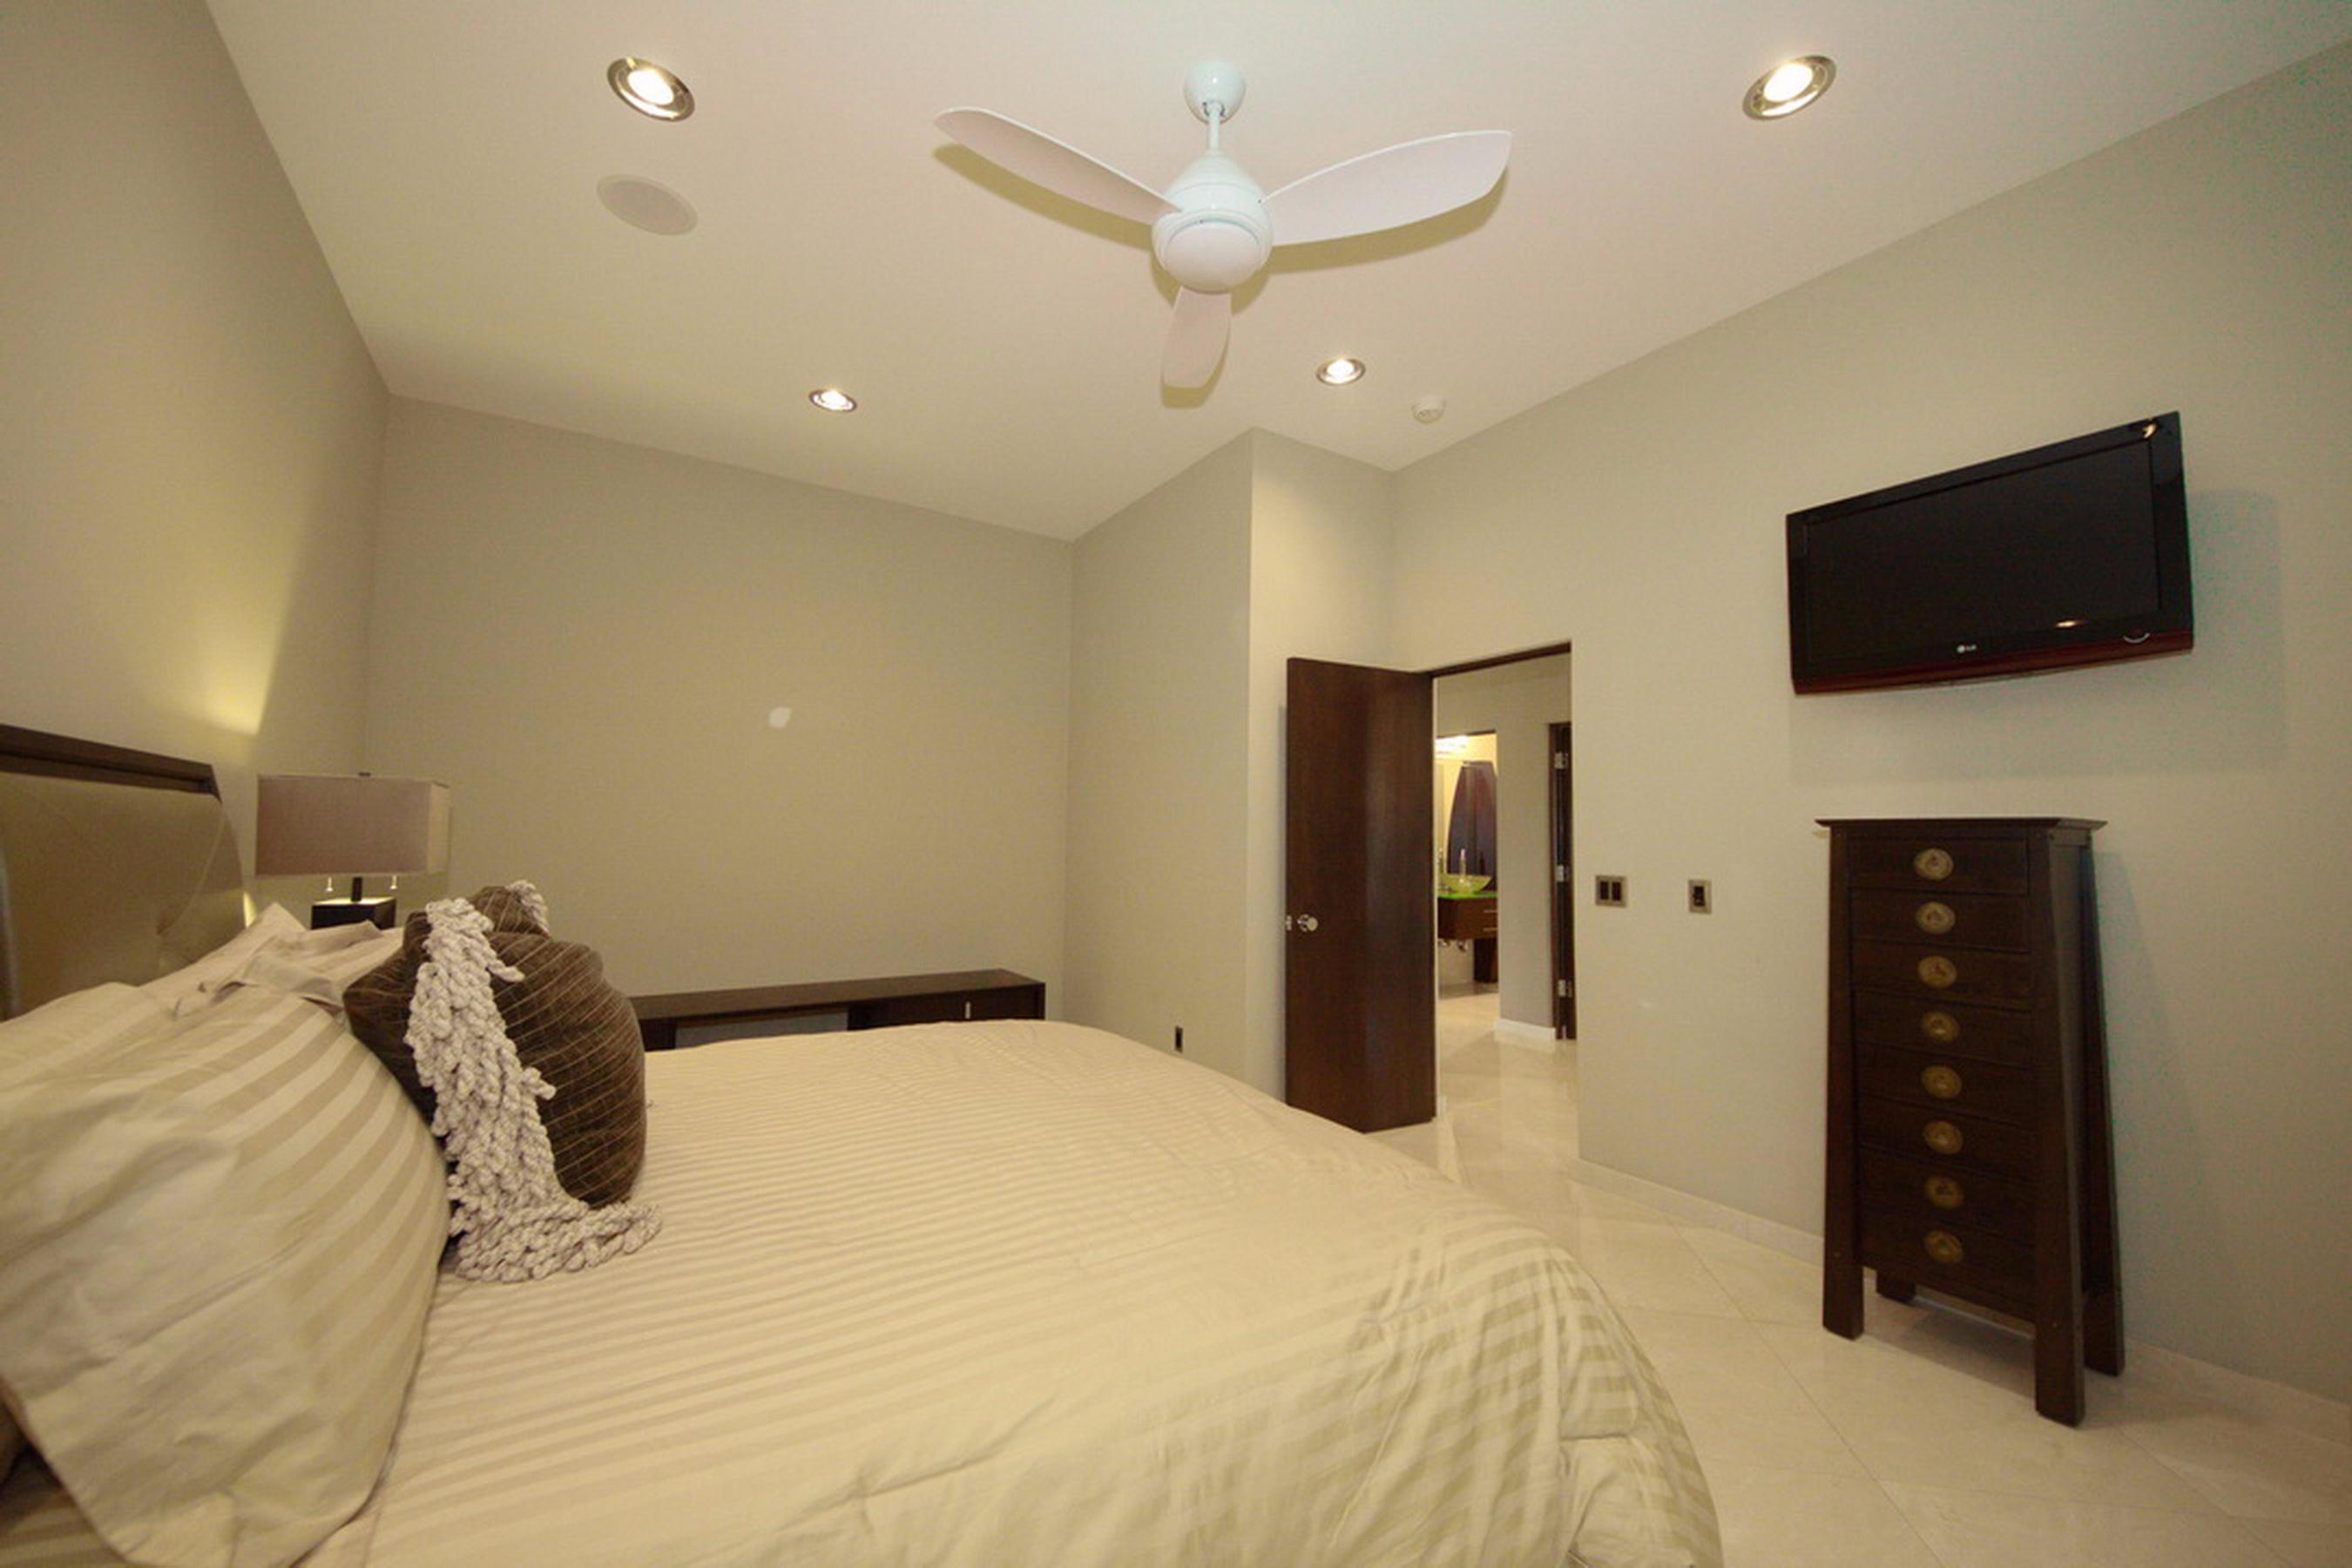 17-Guest Bed Room P2